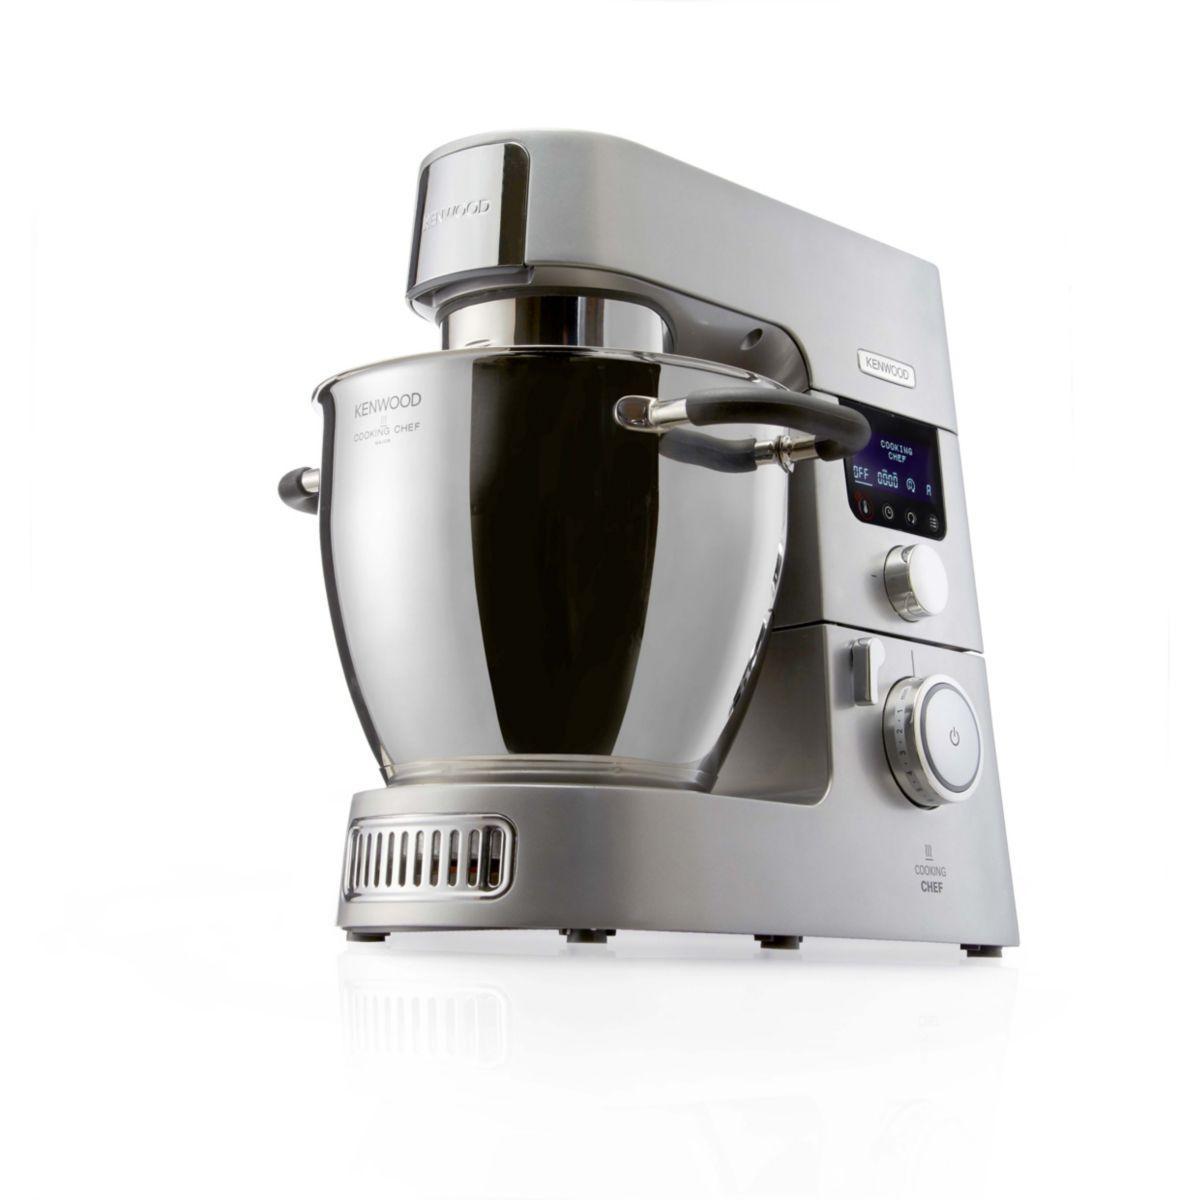 Robot cuiseur KENWOOD Cooking chef Major Gourmet KCC9063S